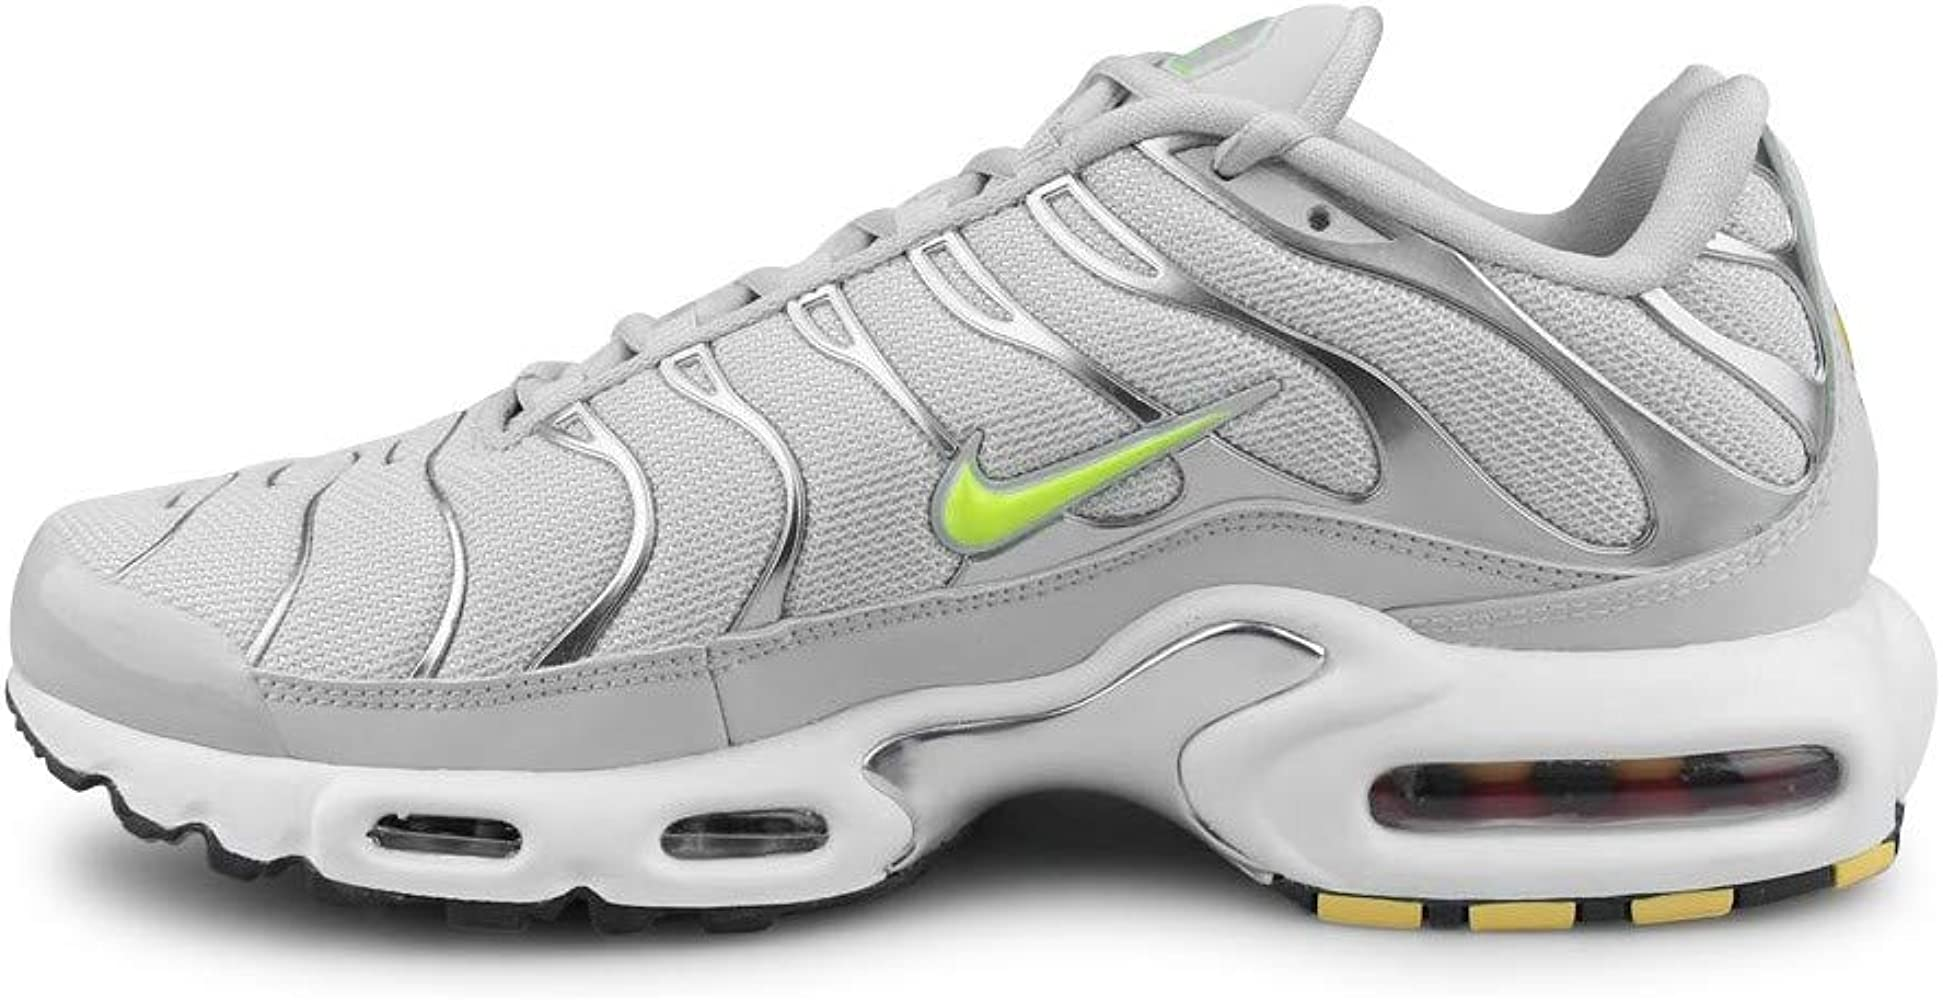 Amazon.com: Nike Air Max Plus TN SE: Shoes